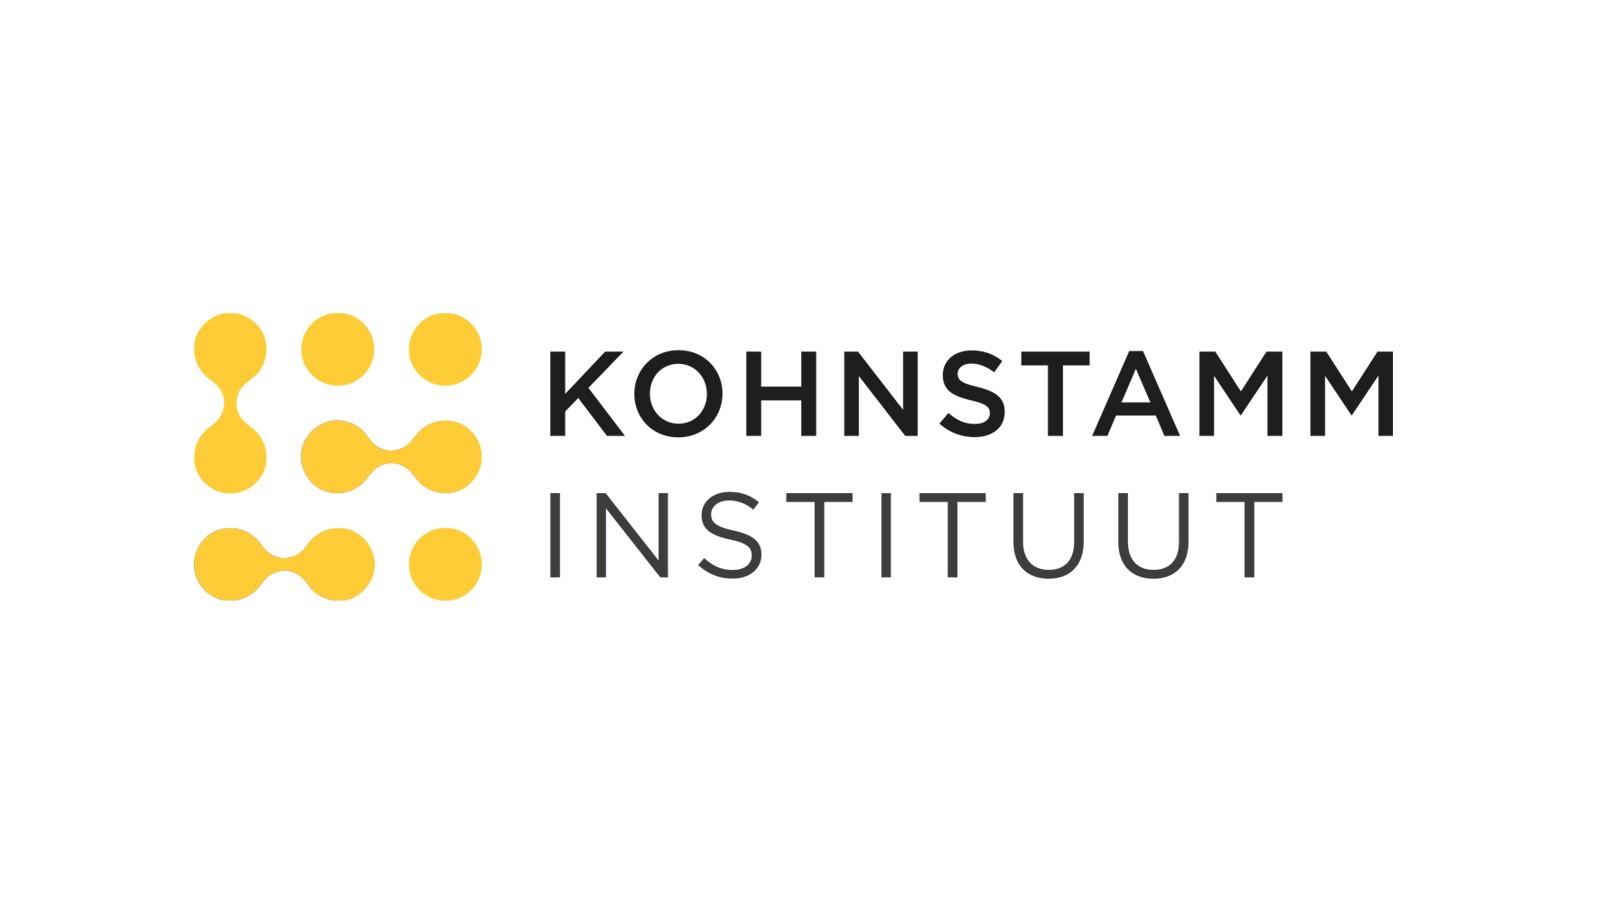 Logo Kohnstamm Instituut - Alternatief voorstel 02